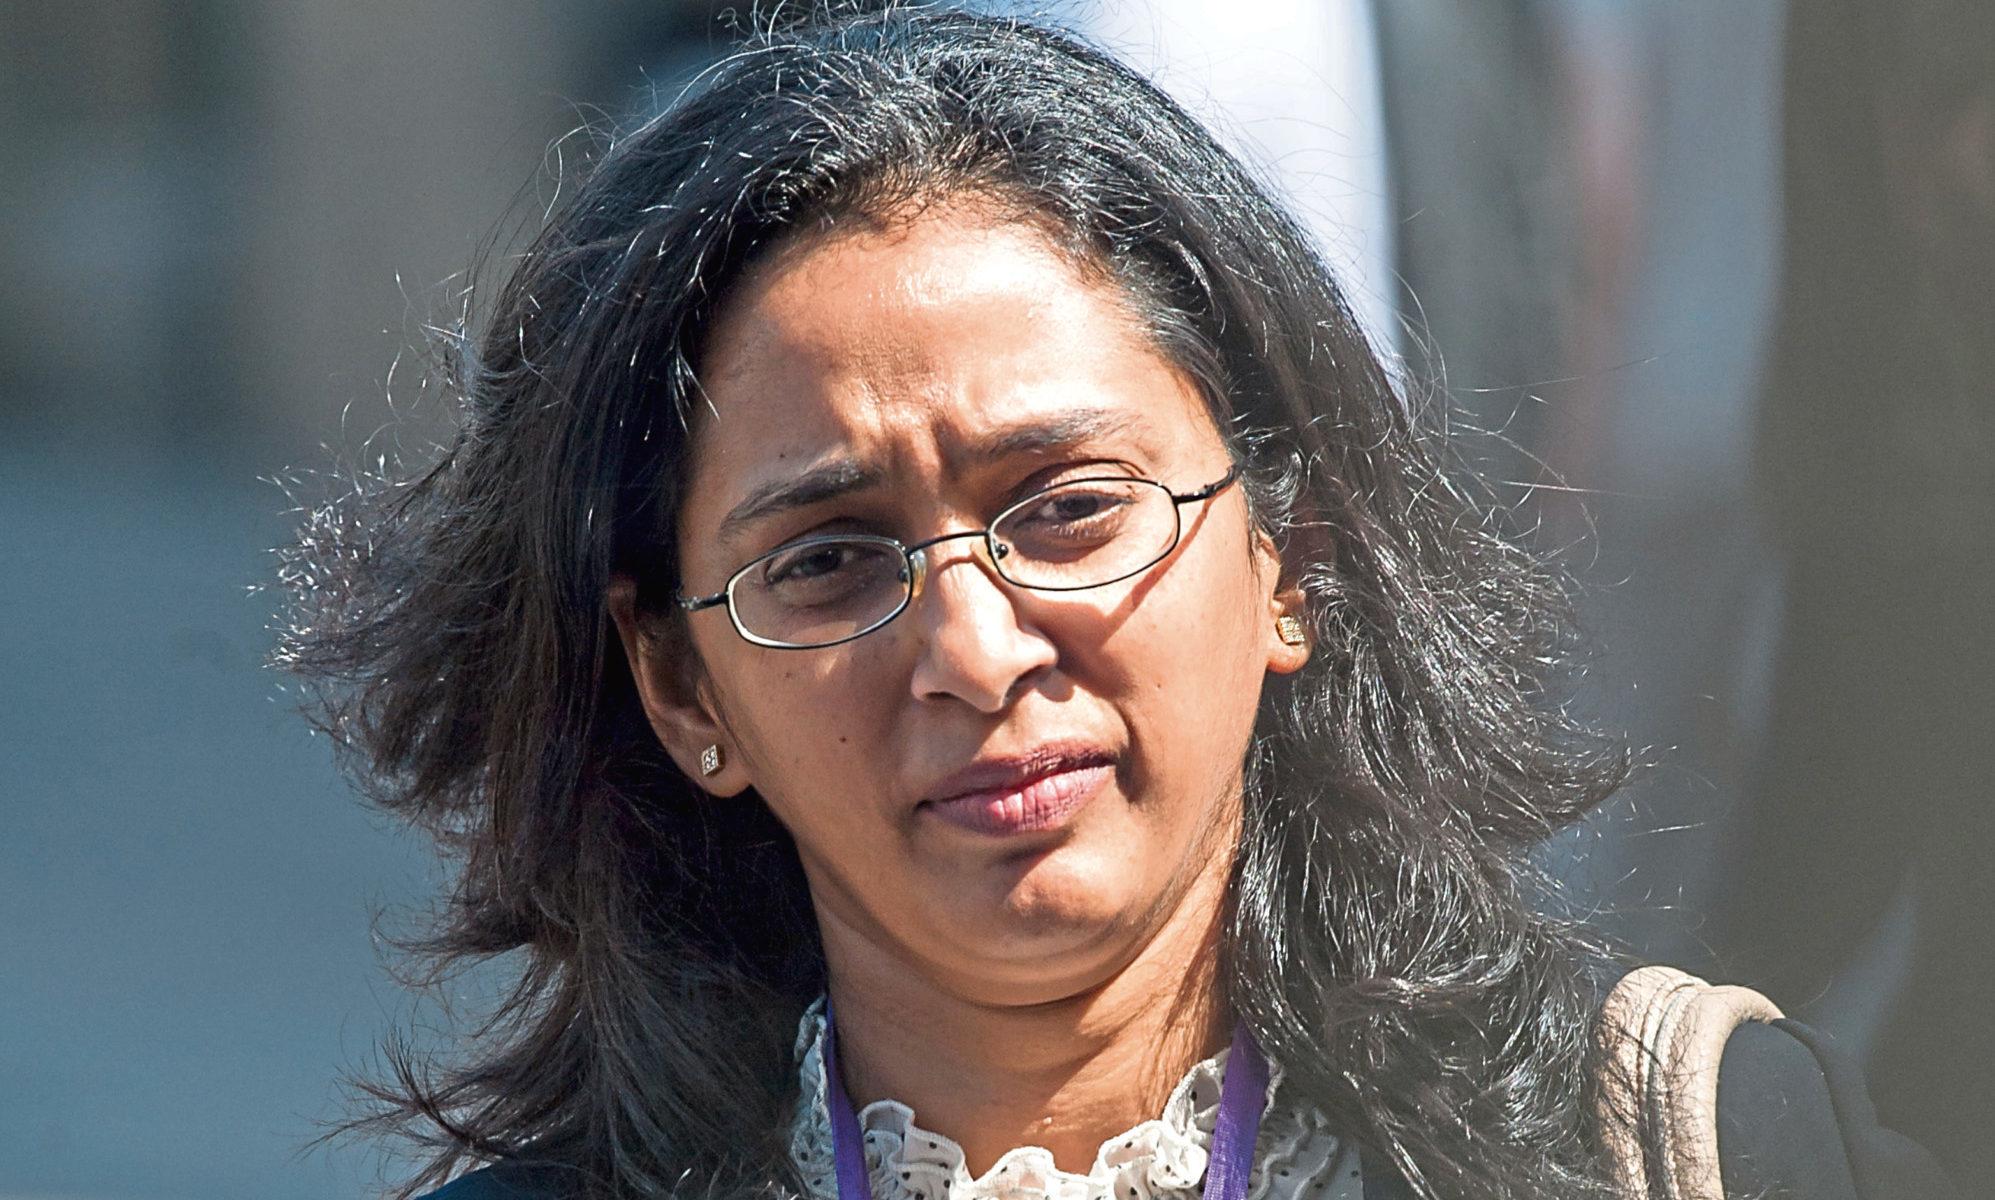 Vaishnavy Laxman